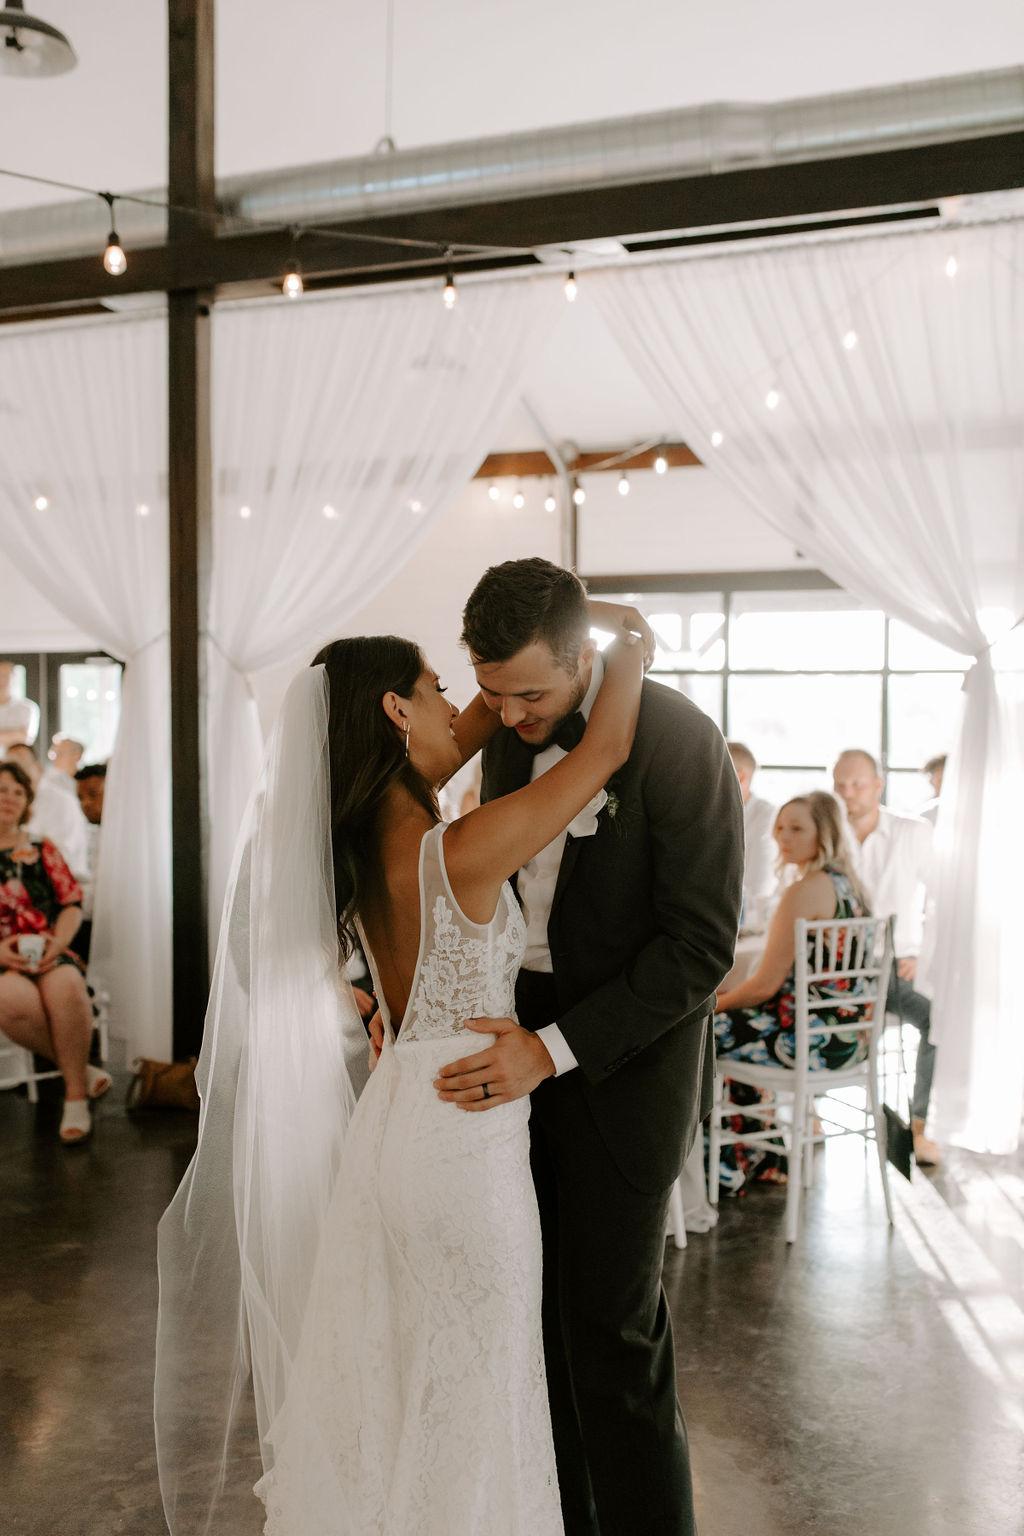 Tulsa White Barn Wedding Venue Outdoor Ceremony 107.jpg